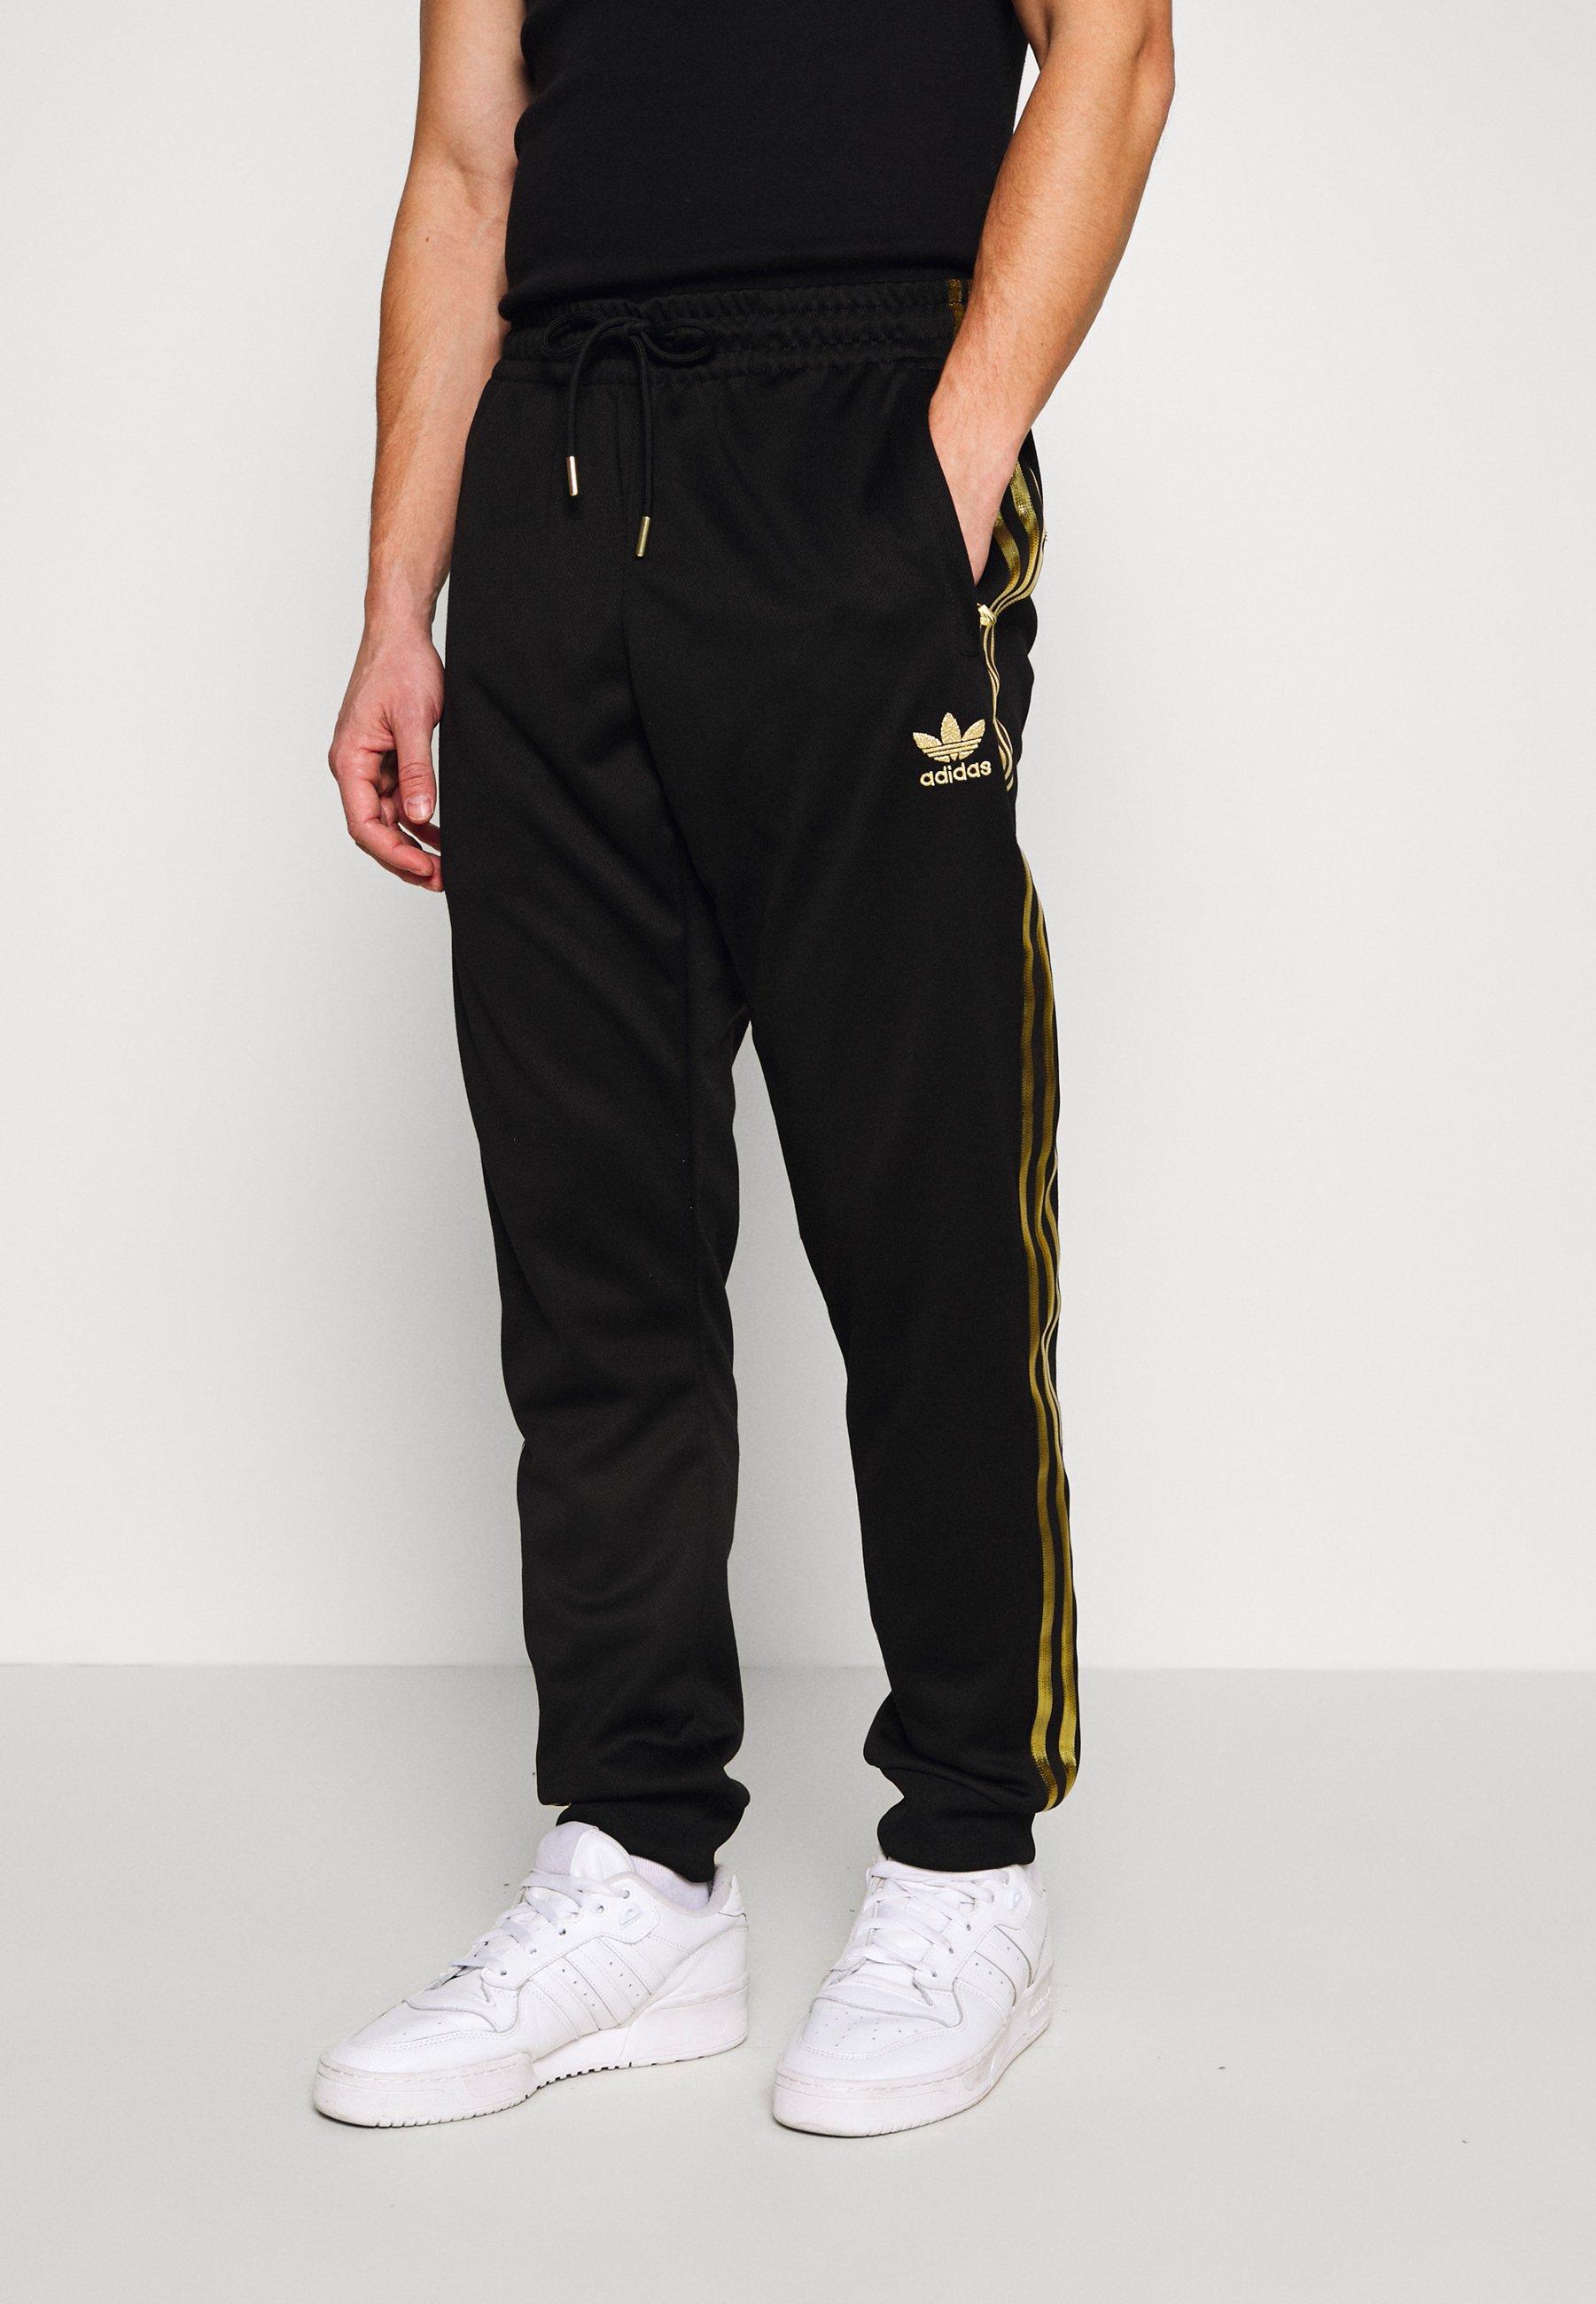 tela Línea de visión Más lejano  adidas Originals SUPERSTAR 3STRIPES TRACK PANTS - Tracksuit bottoms -  black/gold/black - Zalando.co.uk